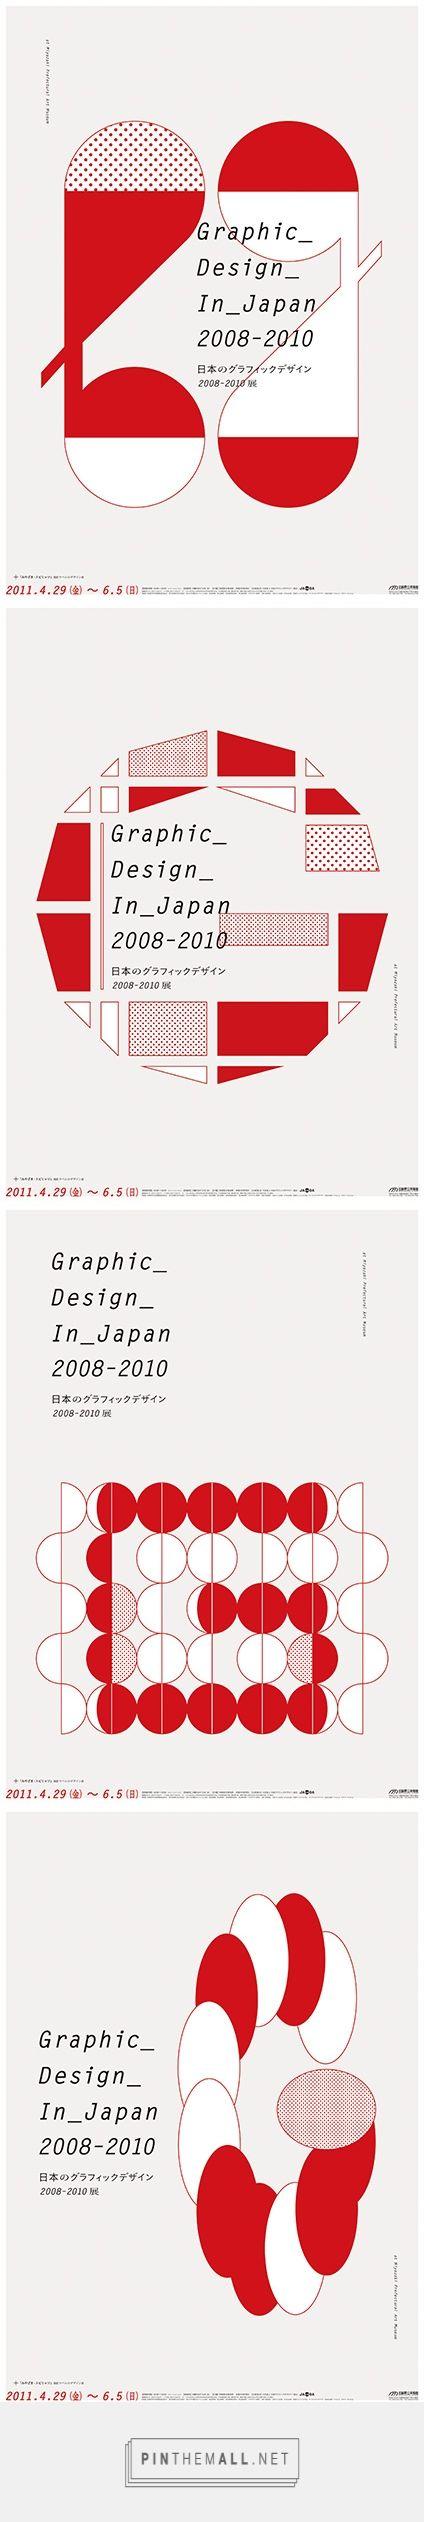 room-composite.com   日本のグラフィックデザイン2008–2010展 - created via https://pinthemall.net